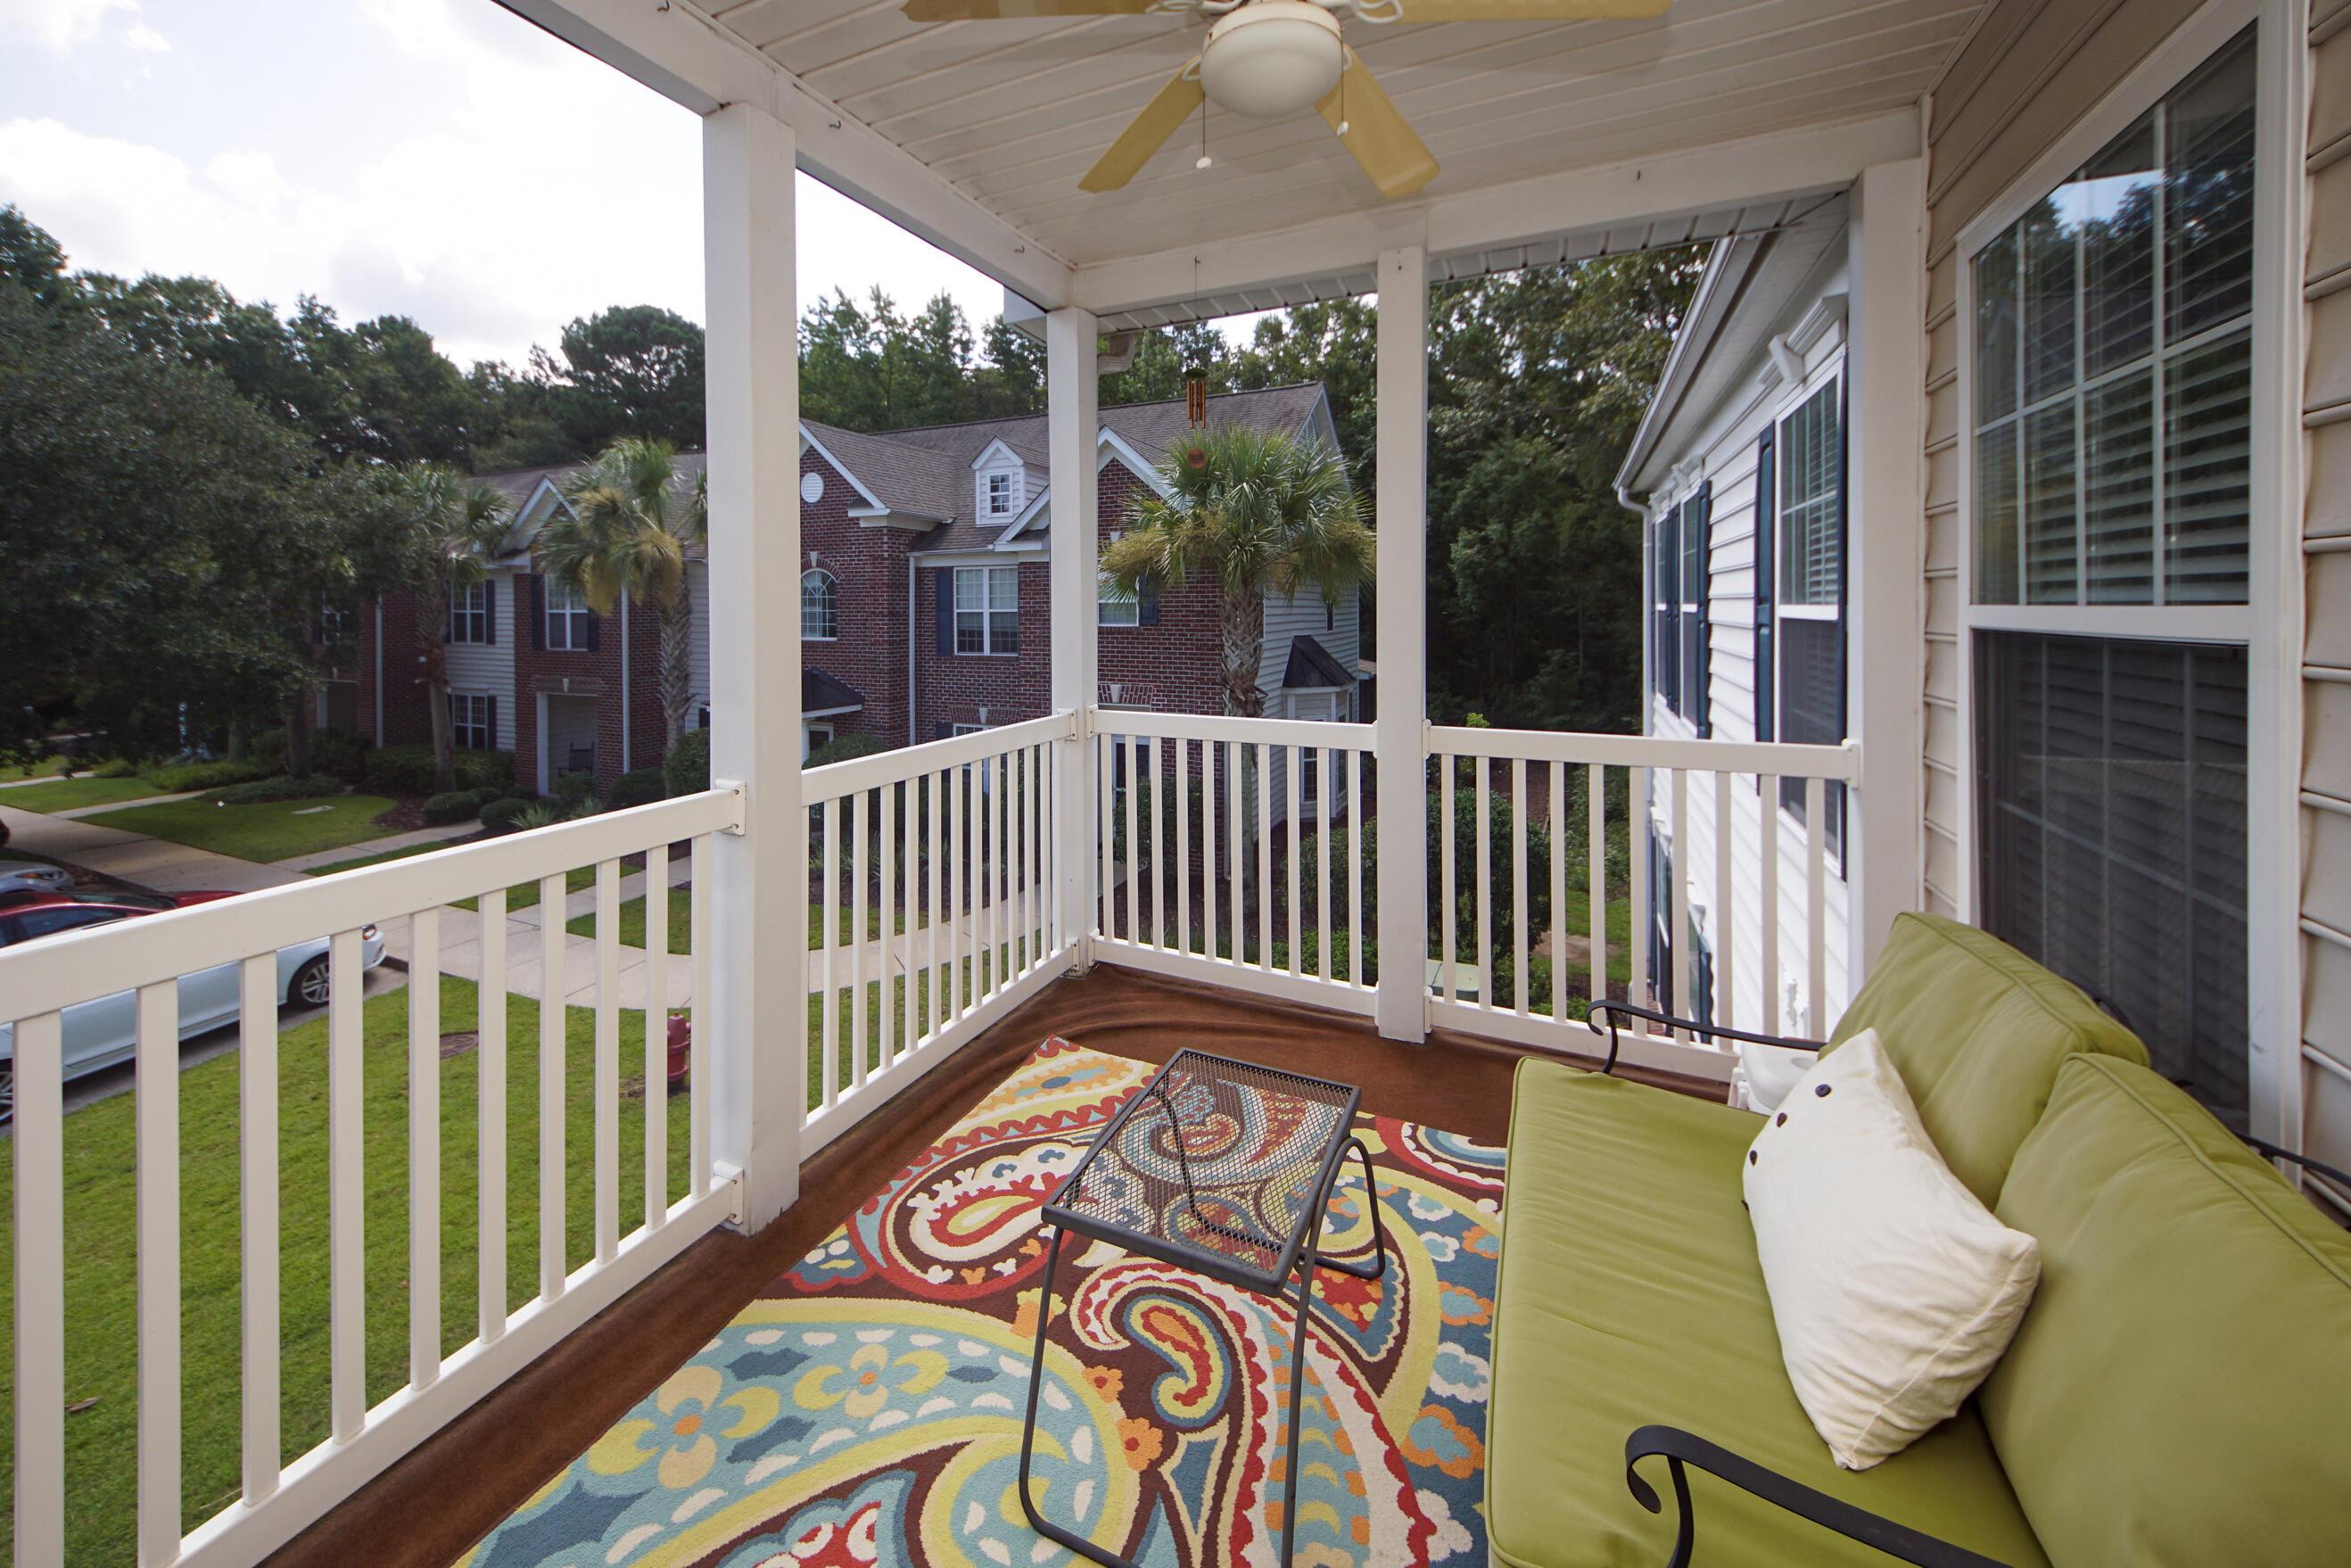 Dunes West Homes For Sale - 1631 Camfield, Mount Pleasant, SC - 5